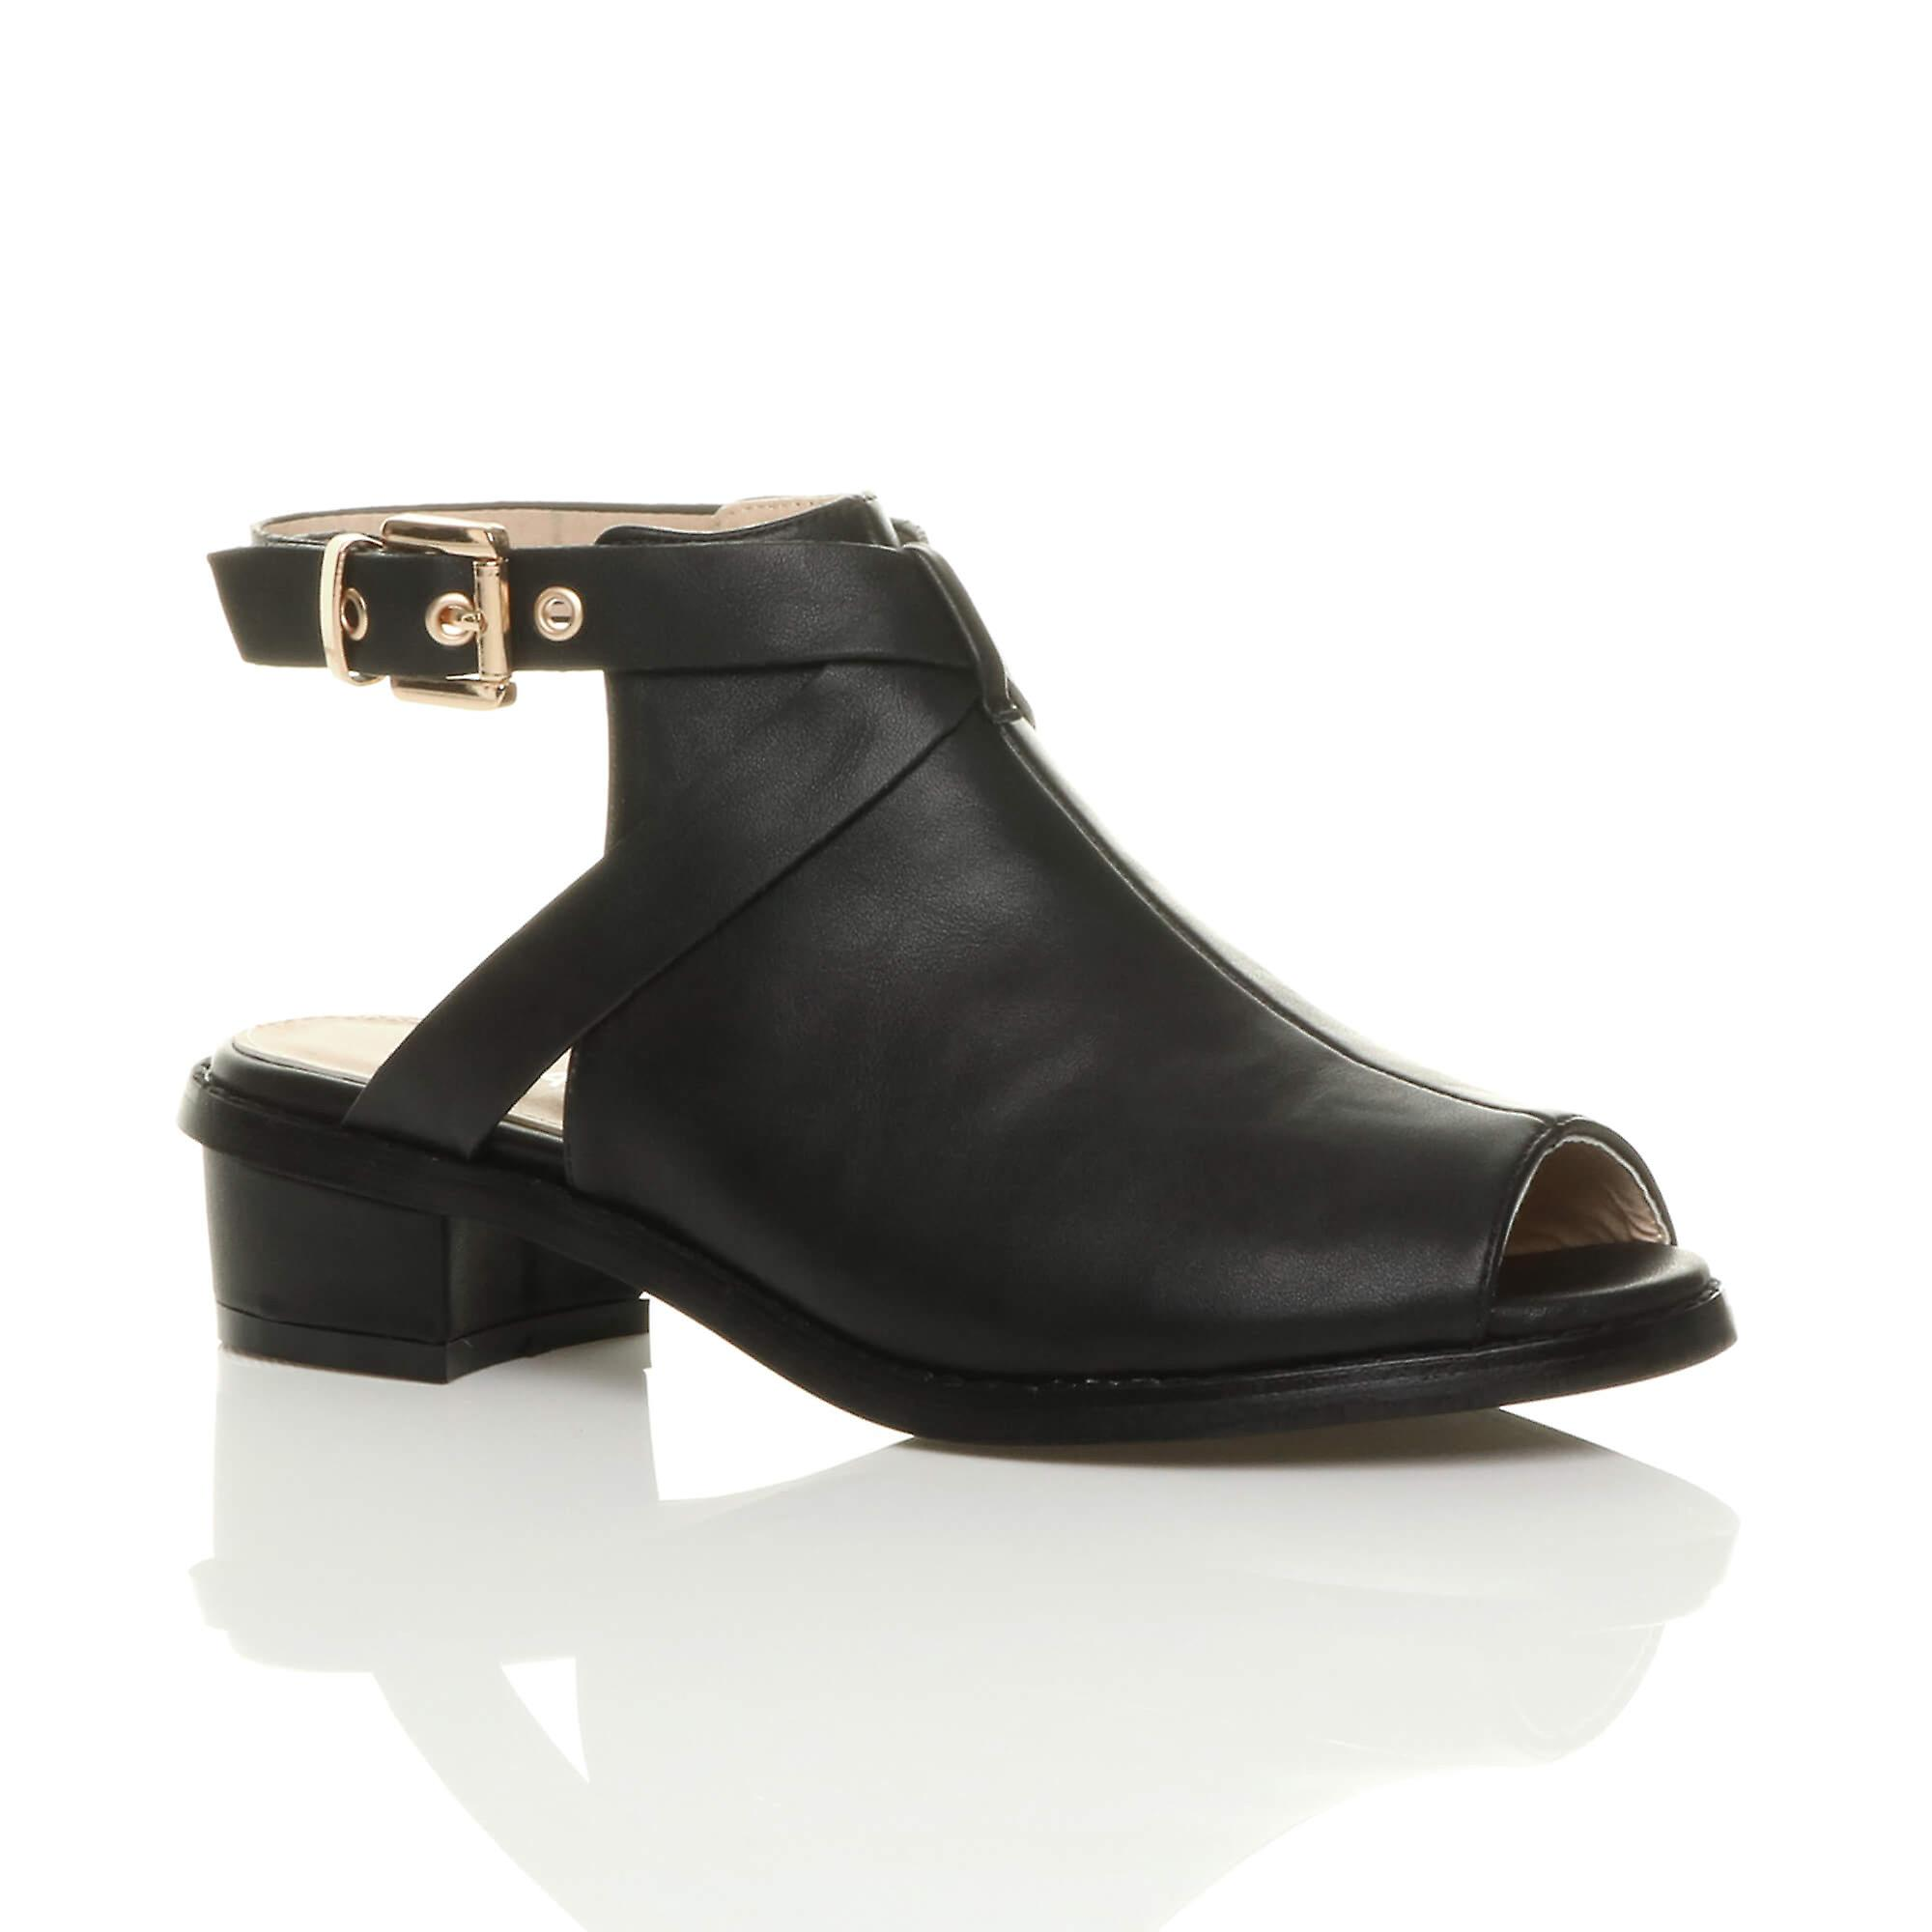 Ajvani womens low mid block heel peep toe buckle ankle strap boots sandals shoes